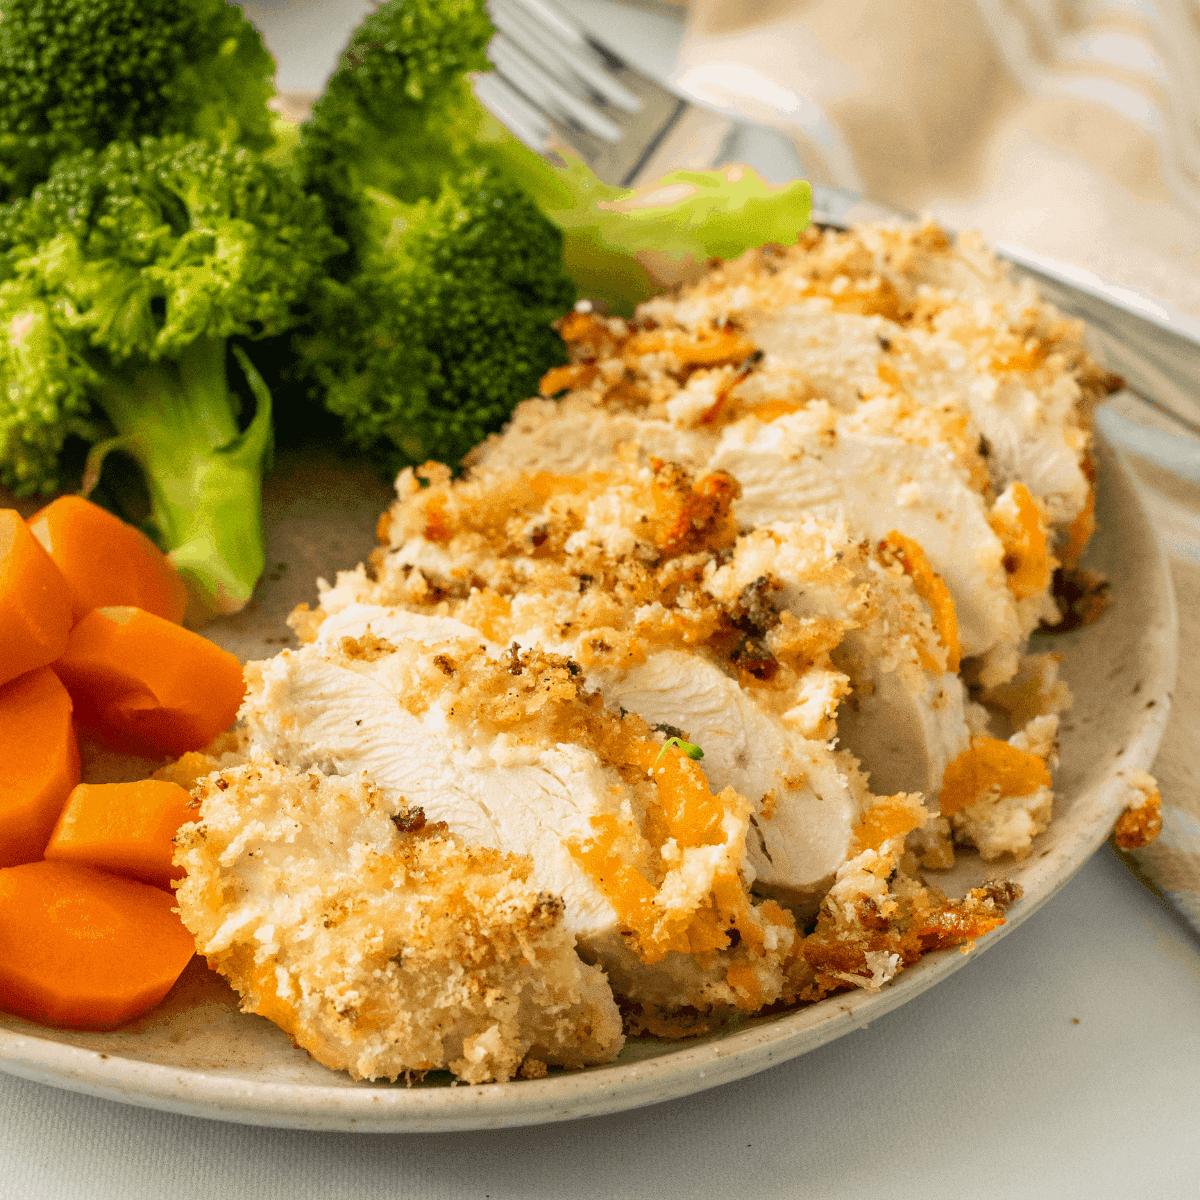 healthy baked ranch chicken recipe.